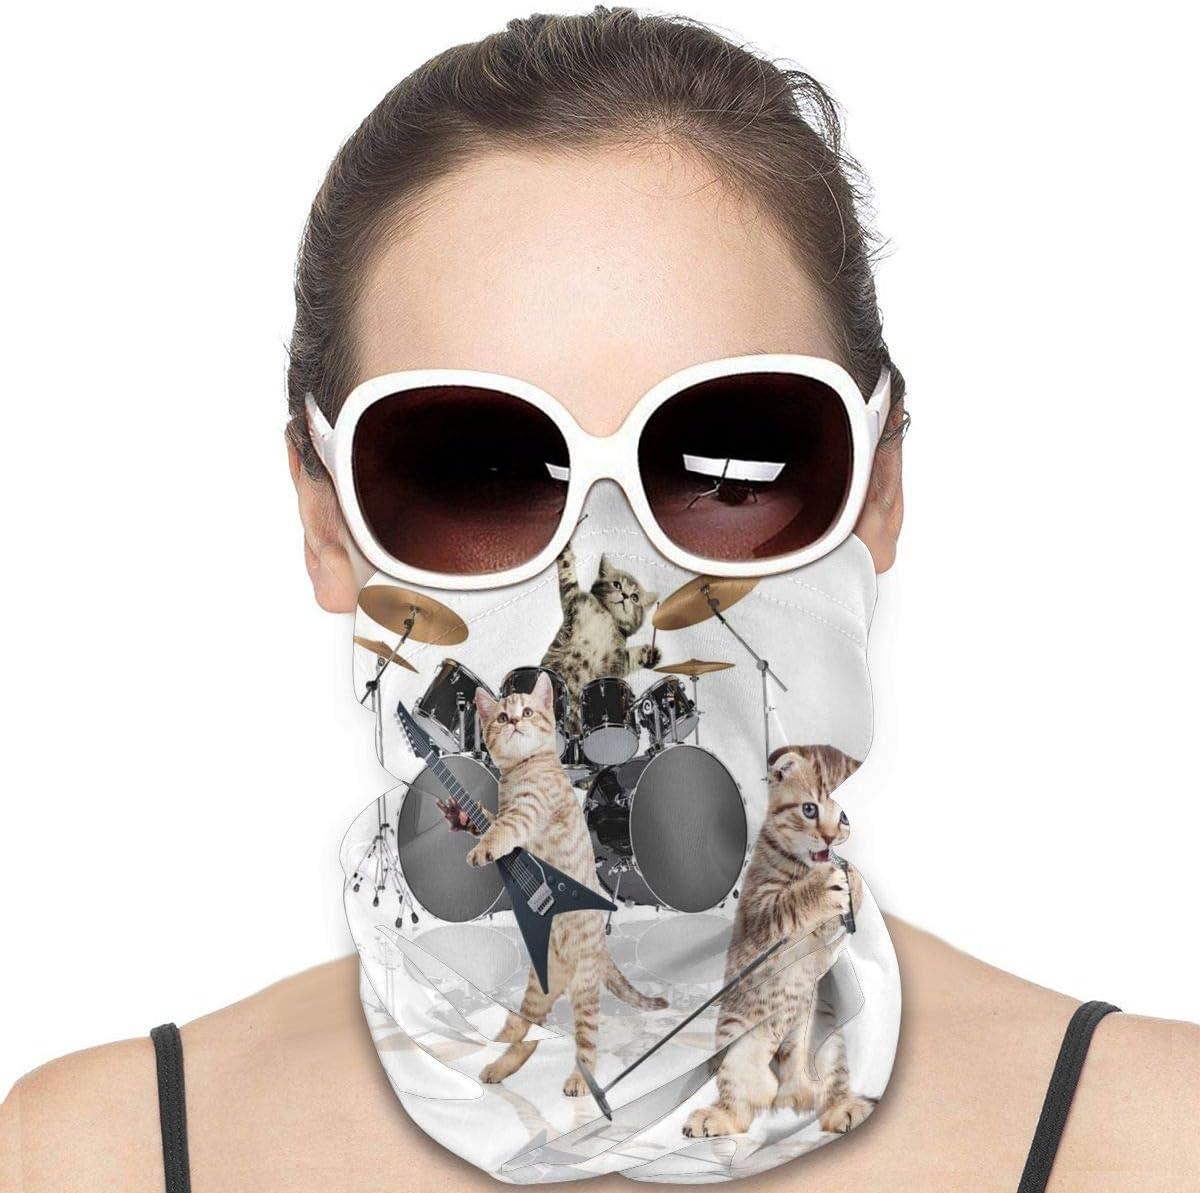 Tidyki Balaclava Sun Protection Face Mask - Rocker Band of Kittens Singer Guitarist Cats Motorcycle Mask Neck Gaiter Multifunctional Headwear Head Bands Neck Warmer Men Headbands Face Mask Bandana